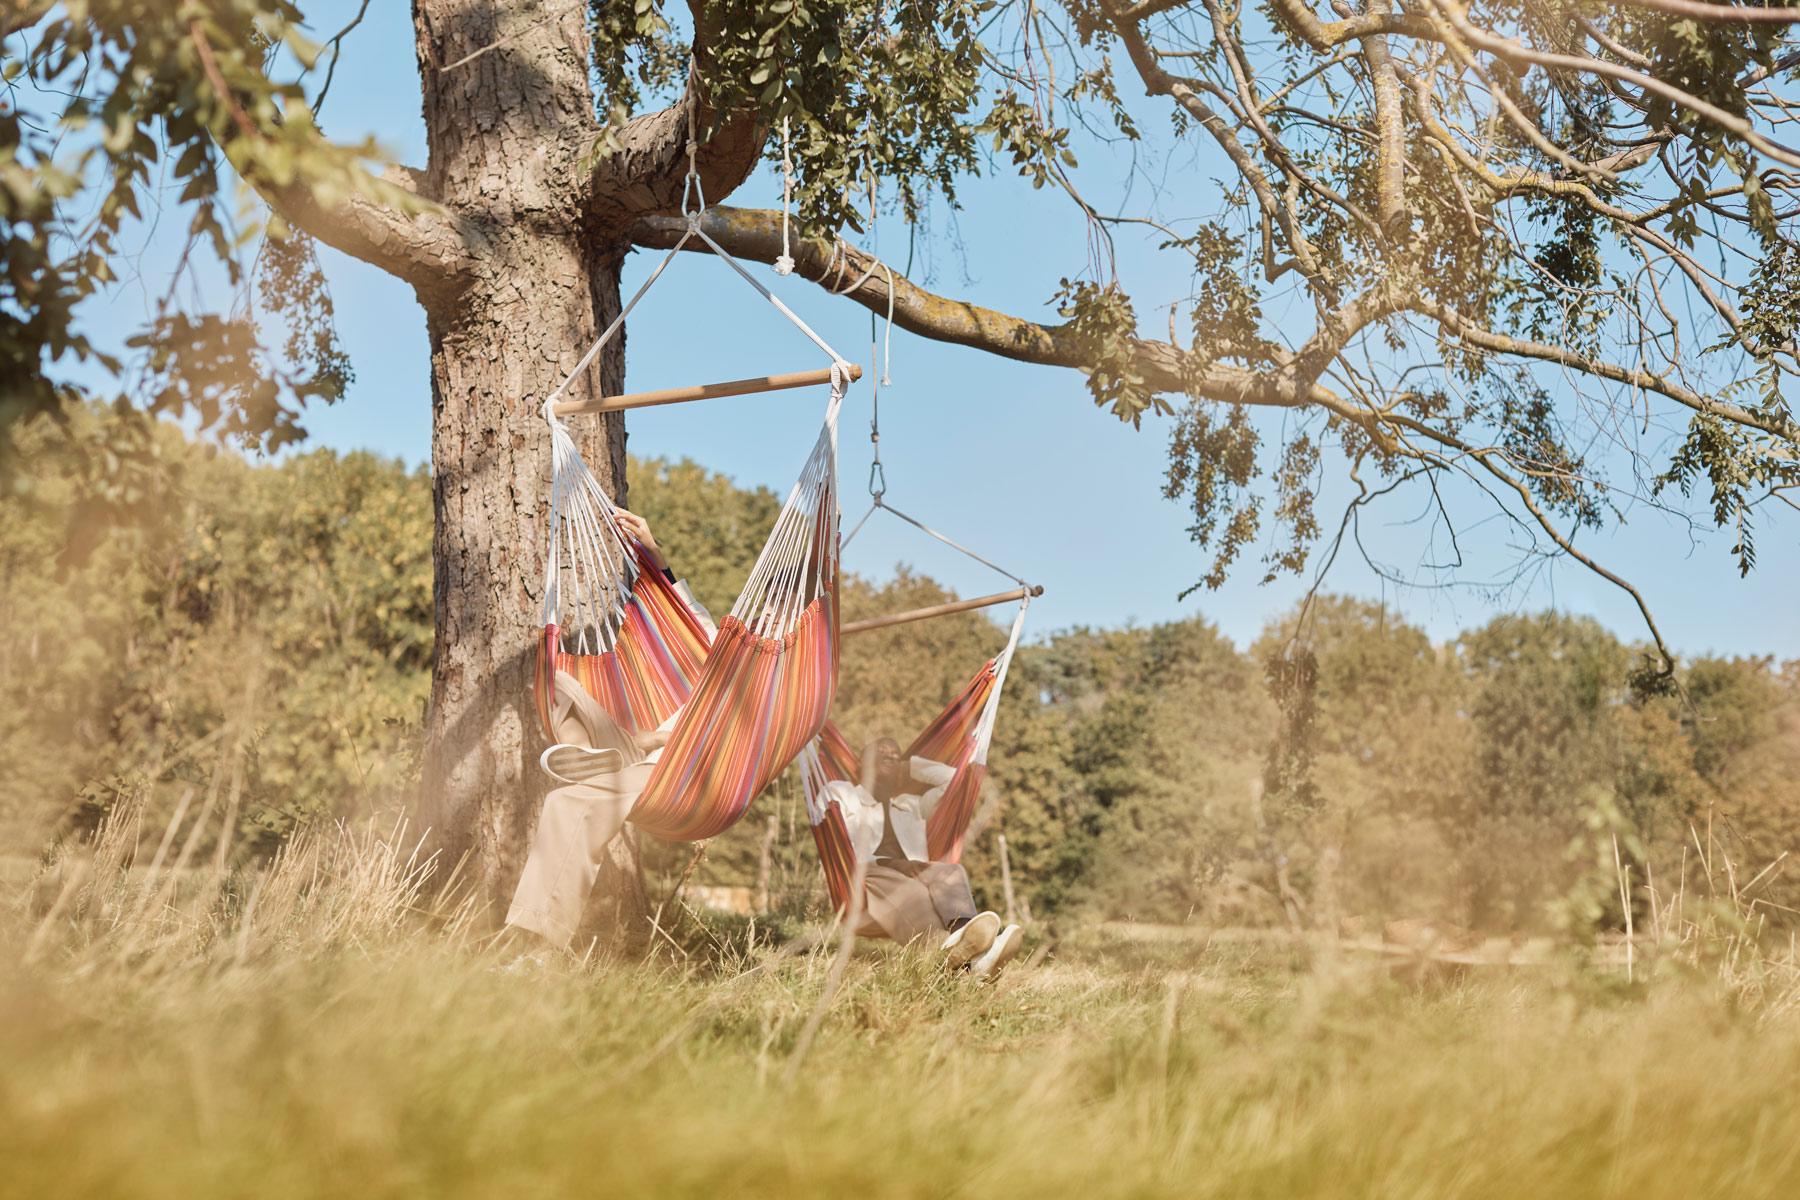 Birch_Hammocks-Landscape_1800-x-1200_02